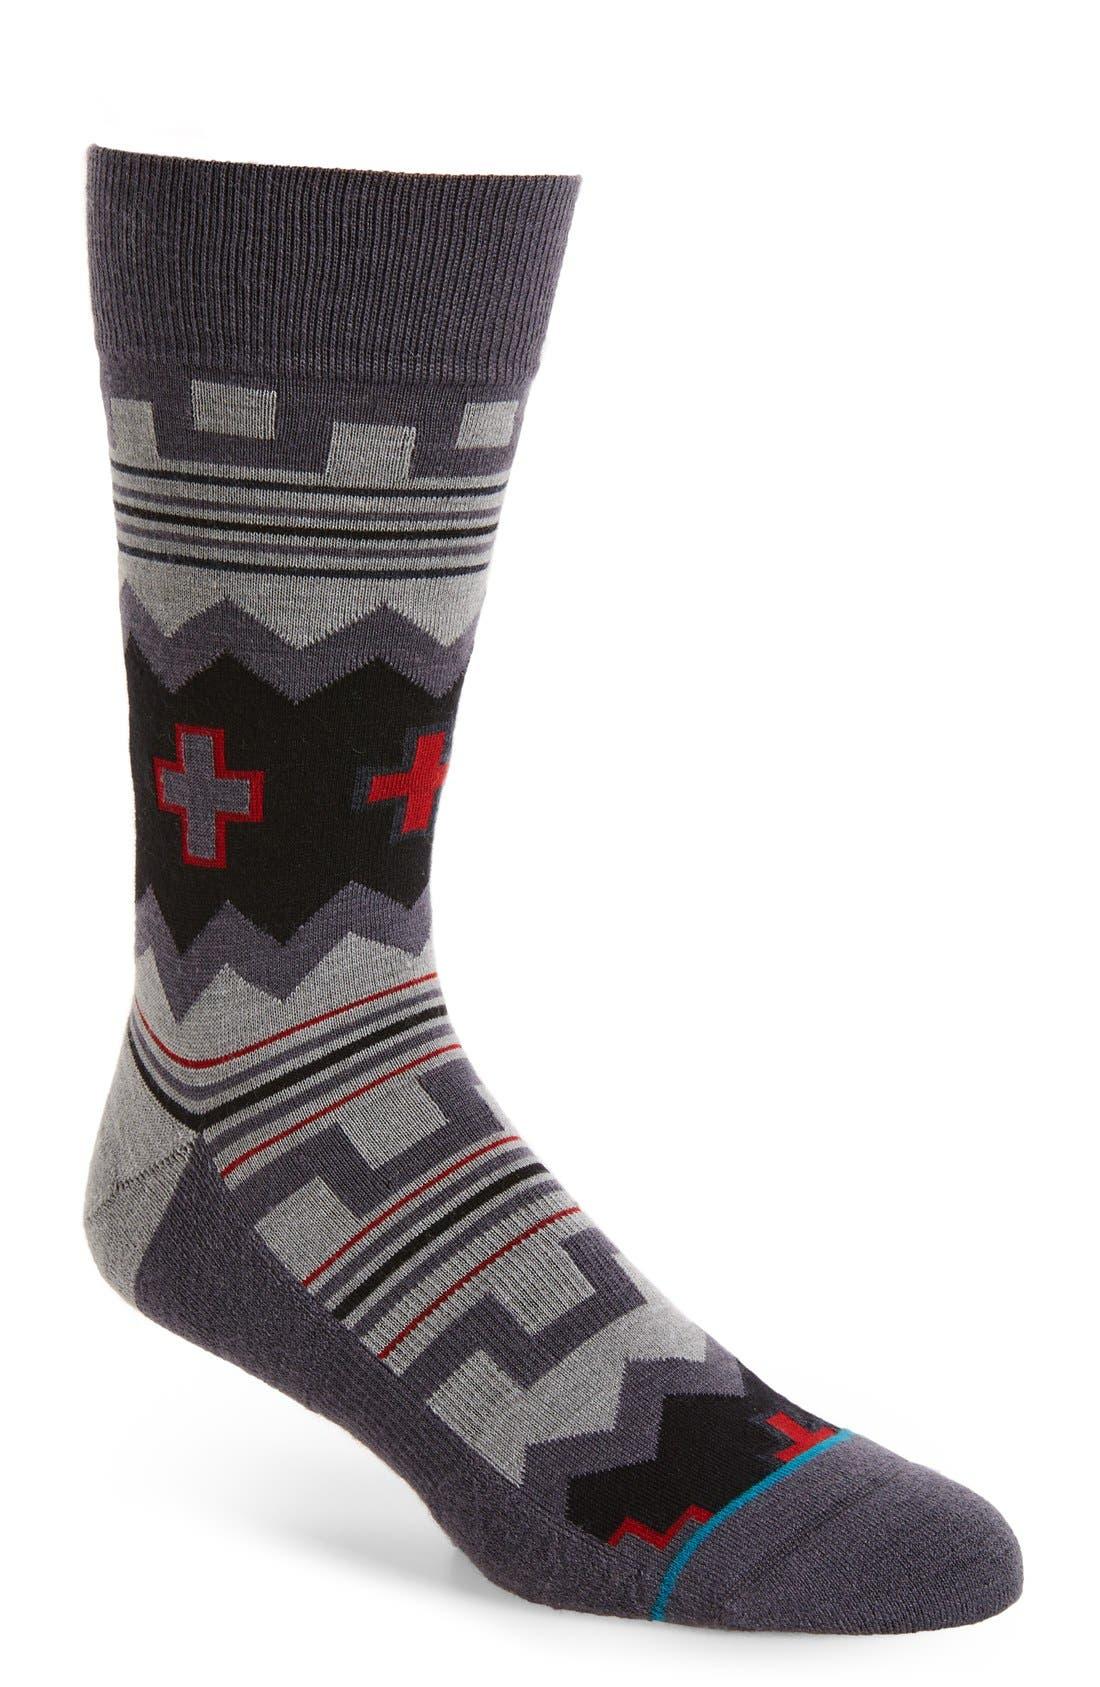 Alternate Image 1 Selected - Stance Badon Wool Blend Crew Socks